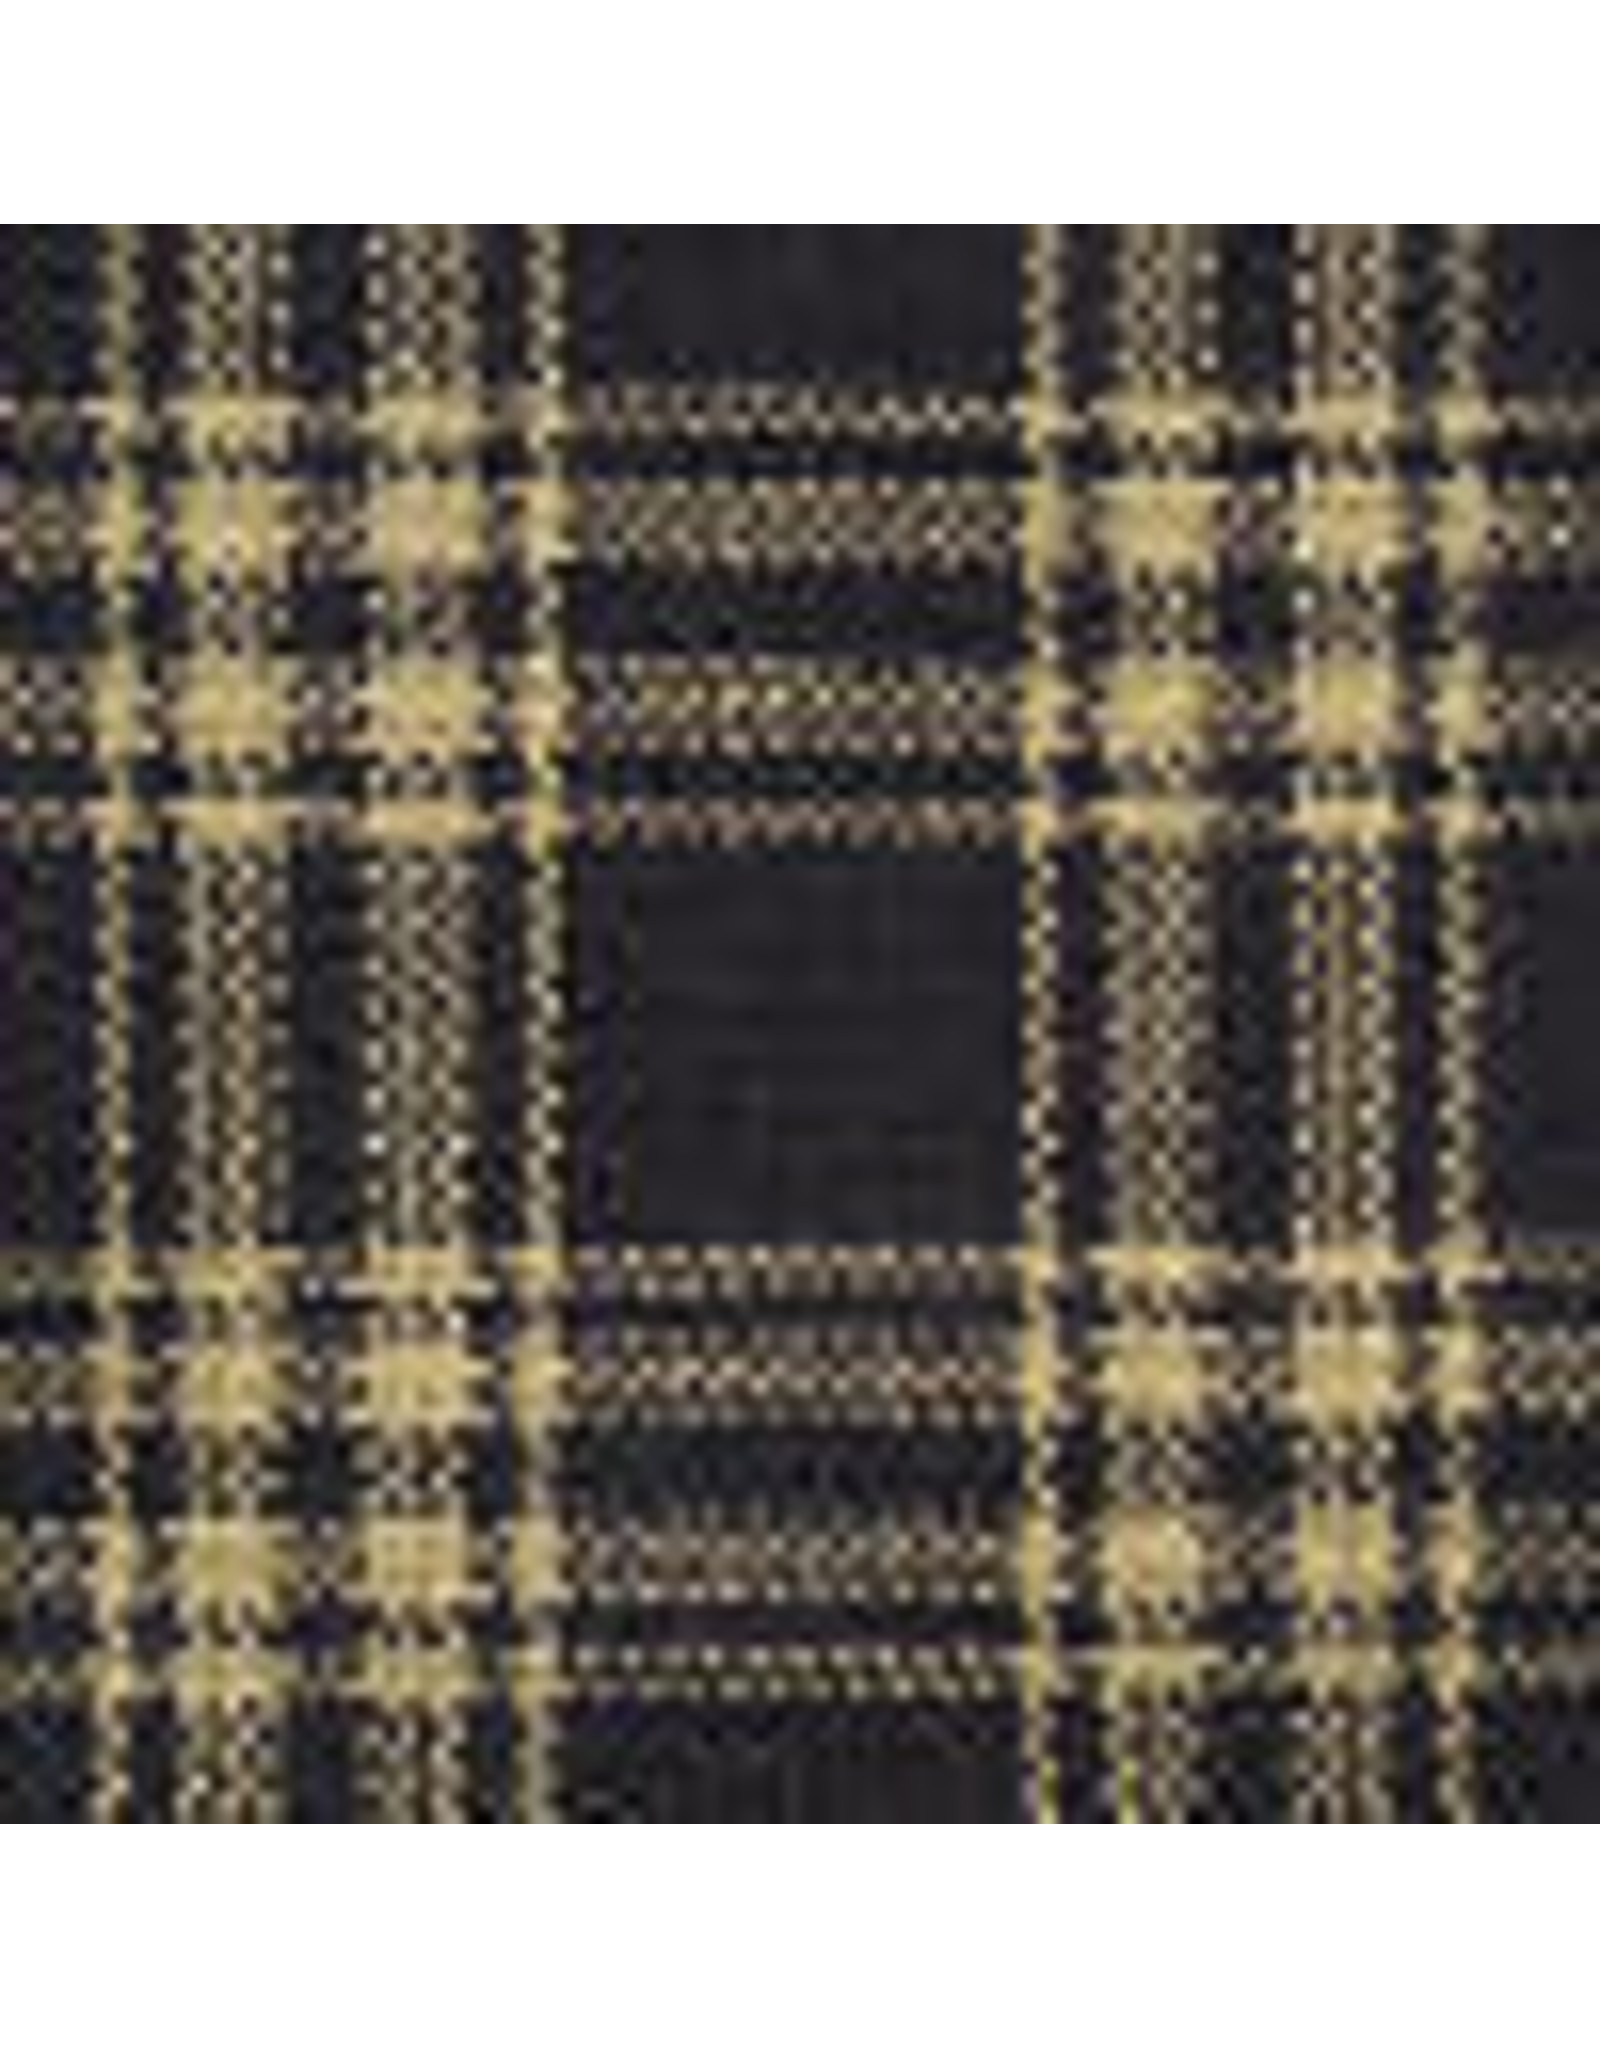 Yd. Navy and Tan Catawba Fabric #21